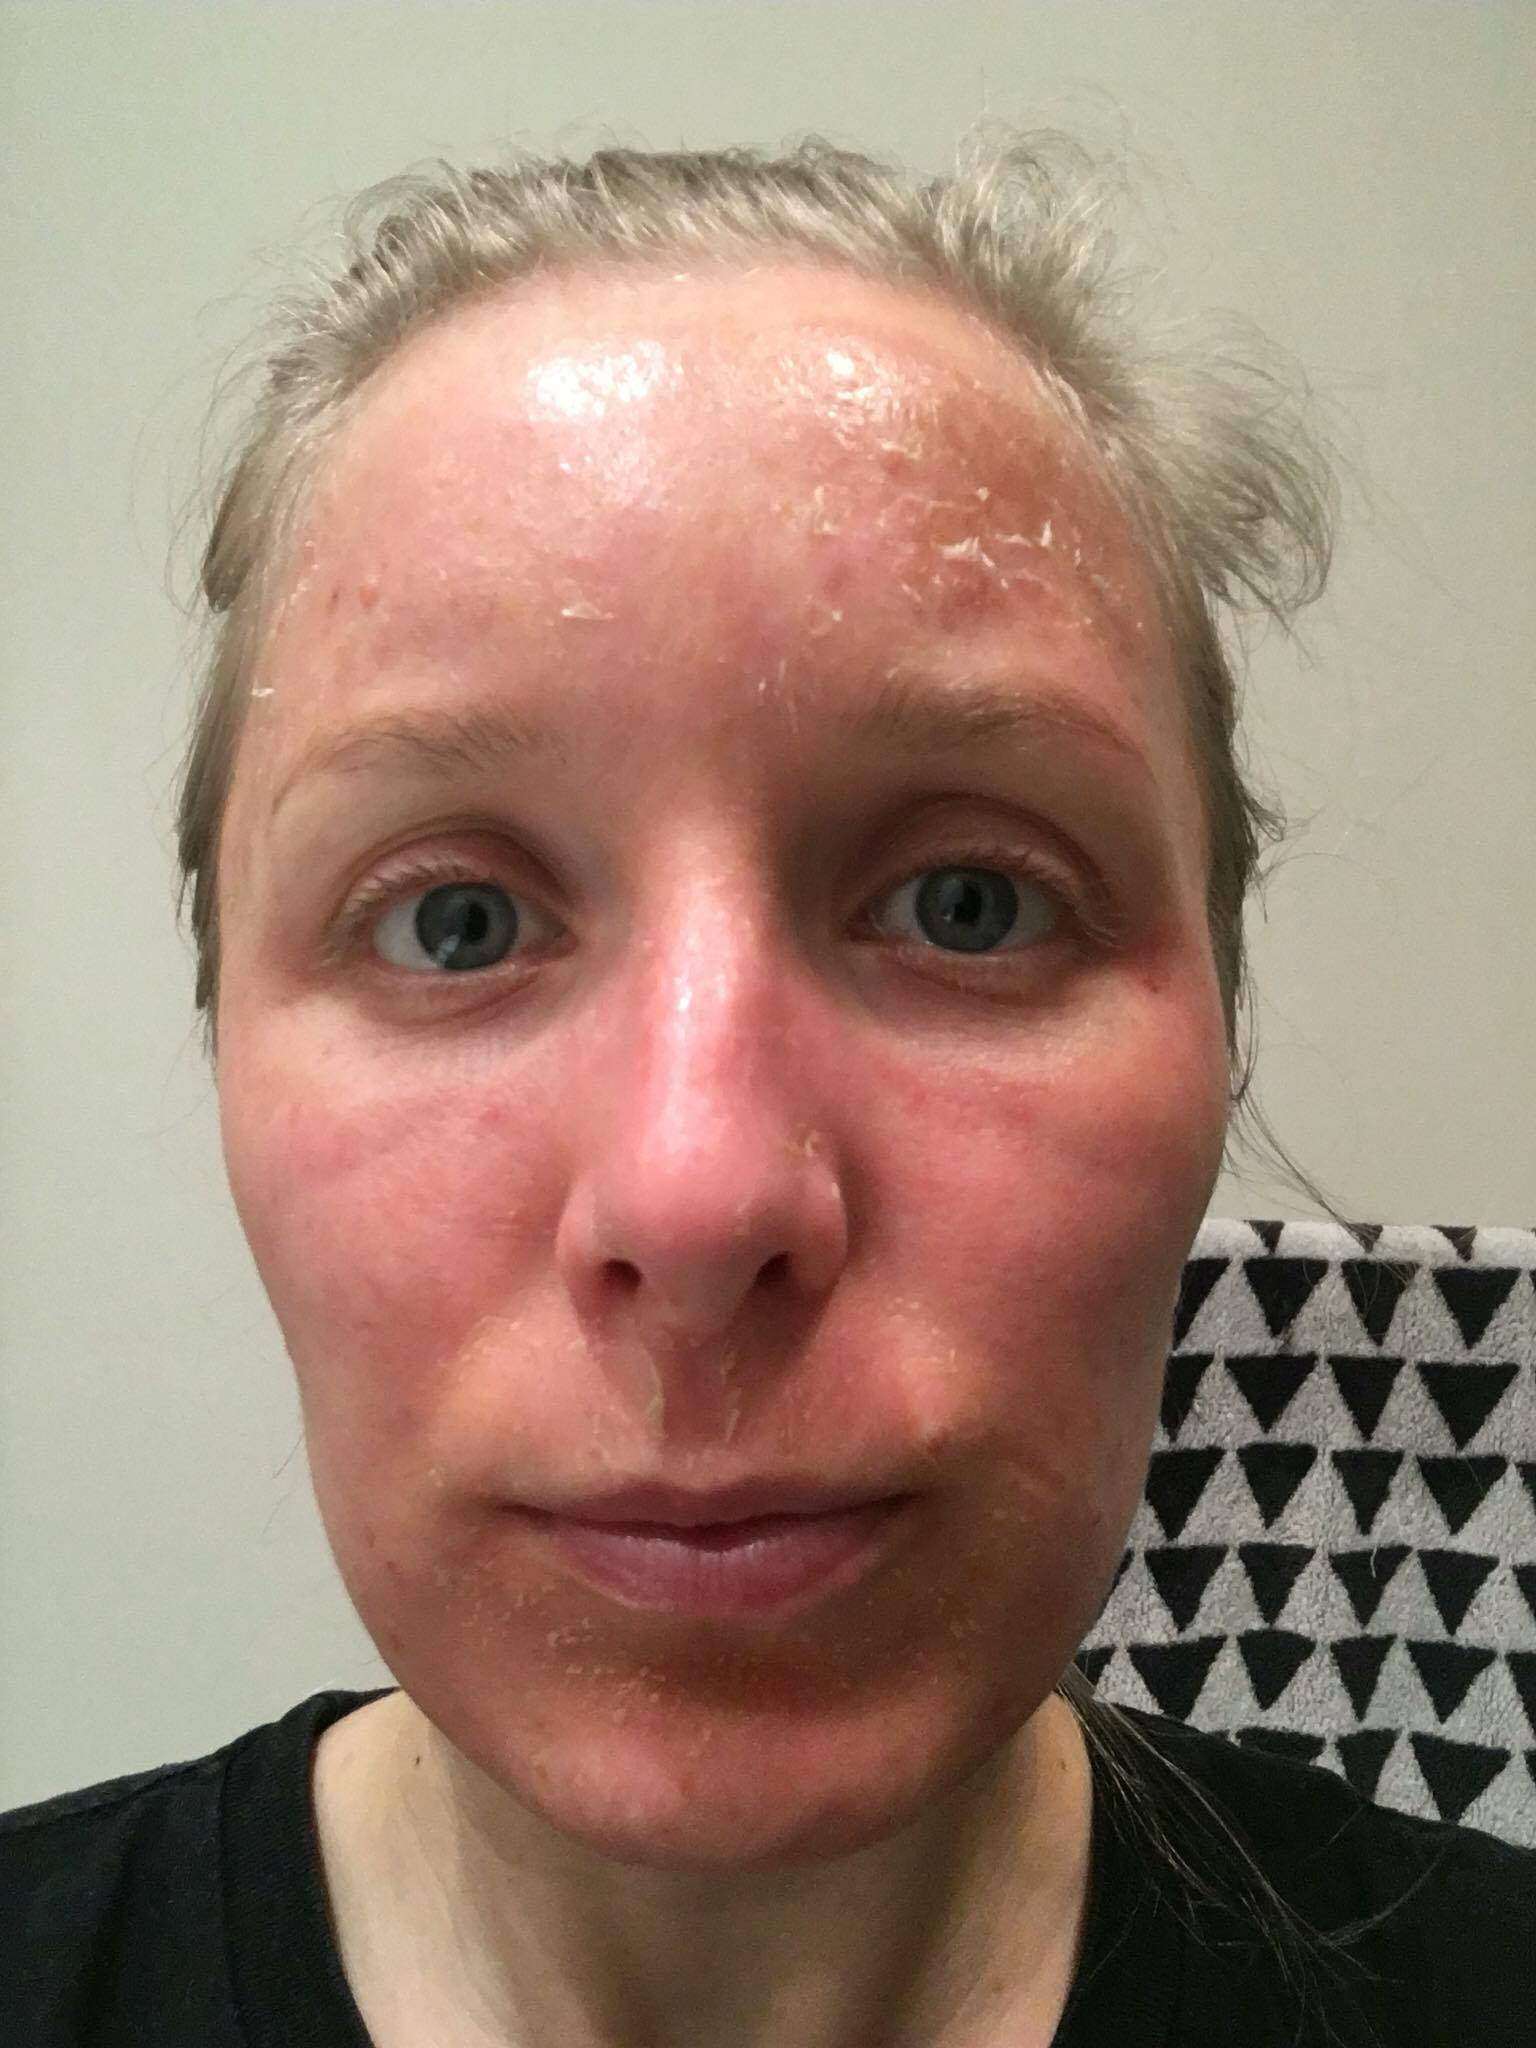 cosmelan dermamelan depigmentation pigmentation skin treatment melasma melbourne skin clinic